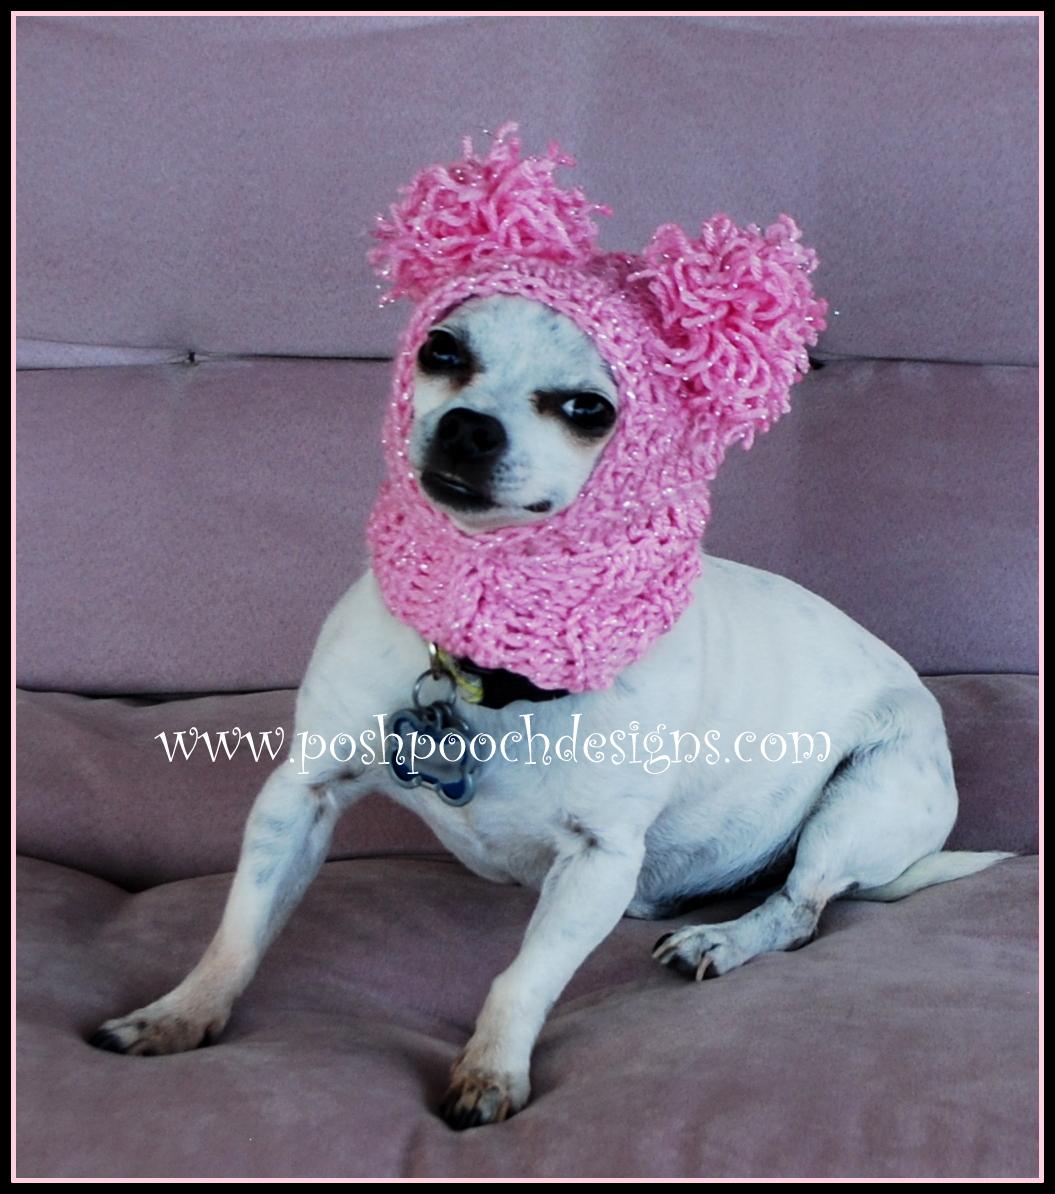 7aec8ae4c68 Posh Pooch Designs Dog Clothes  Pink Pom Pom Dog Snood Crochet ...